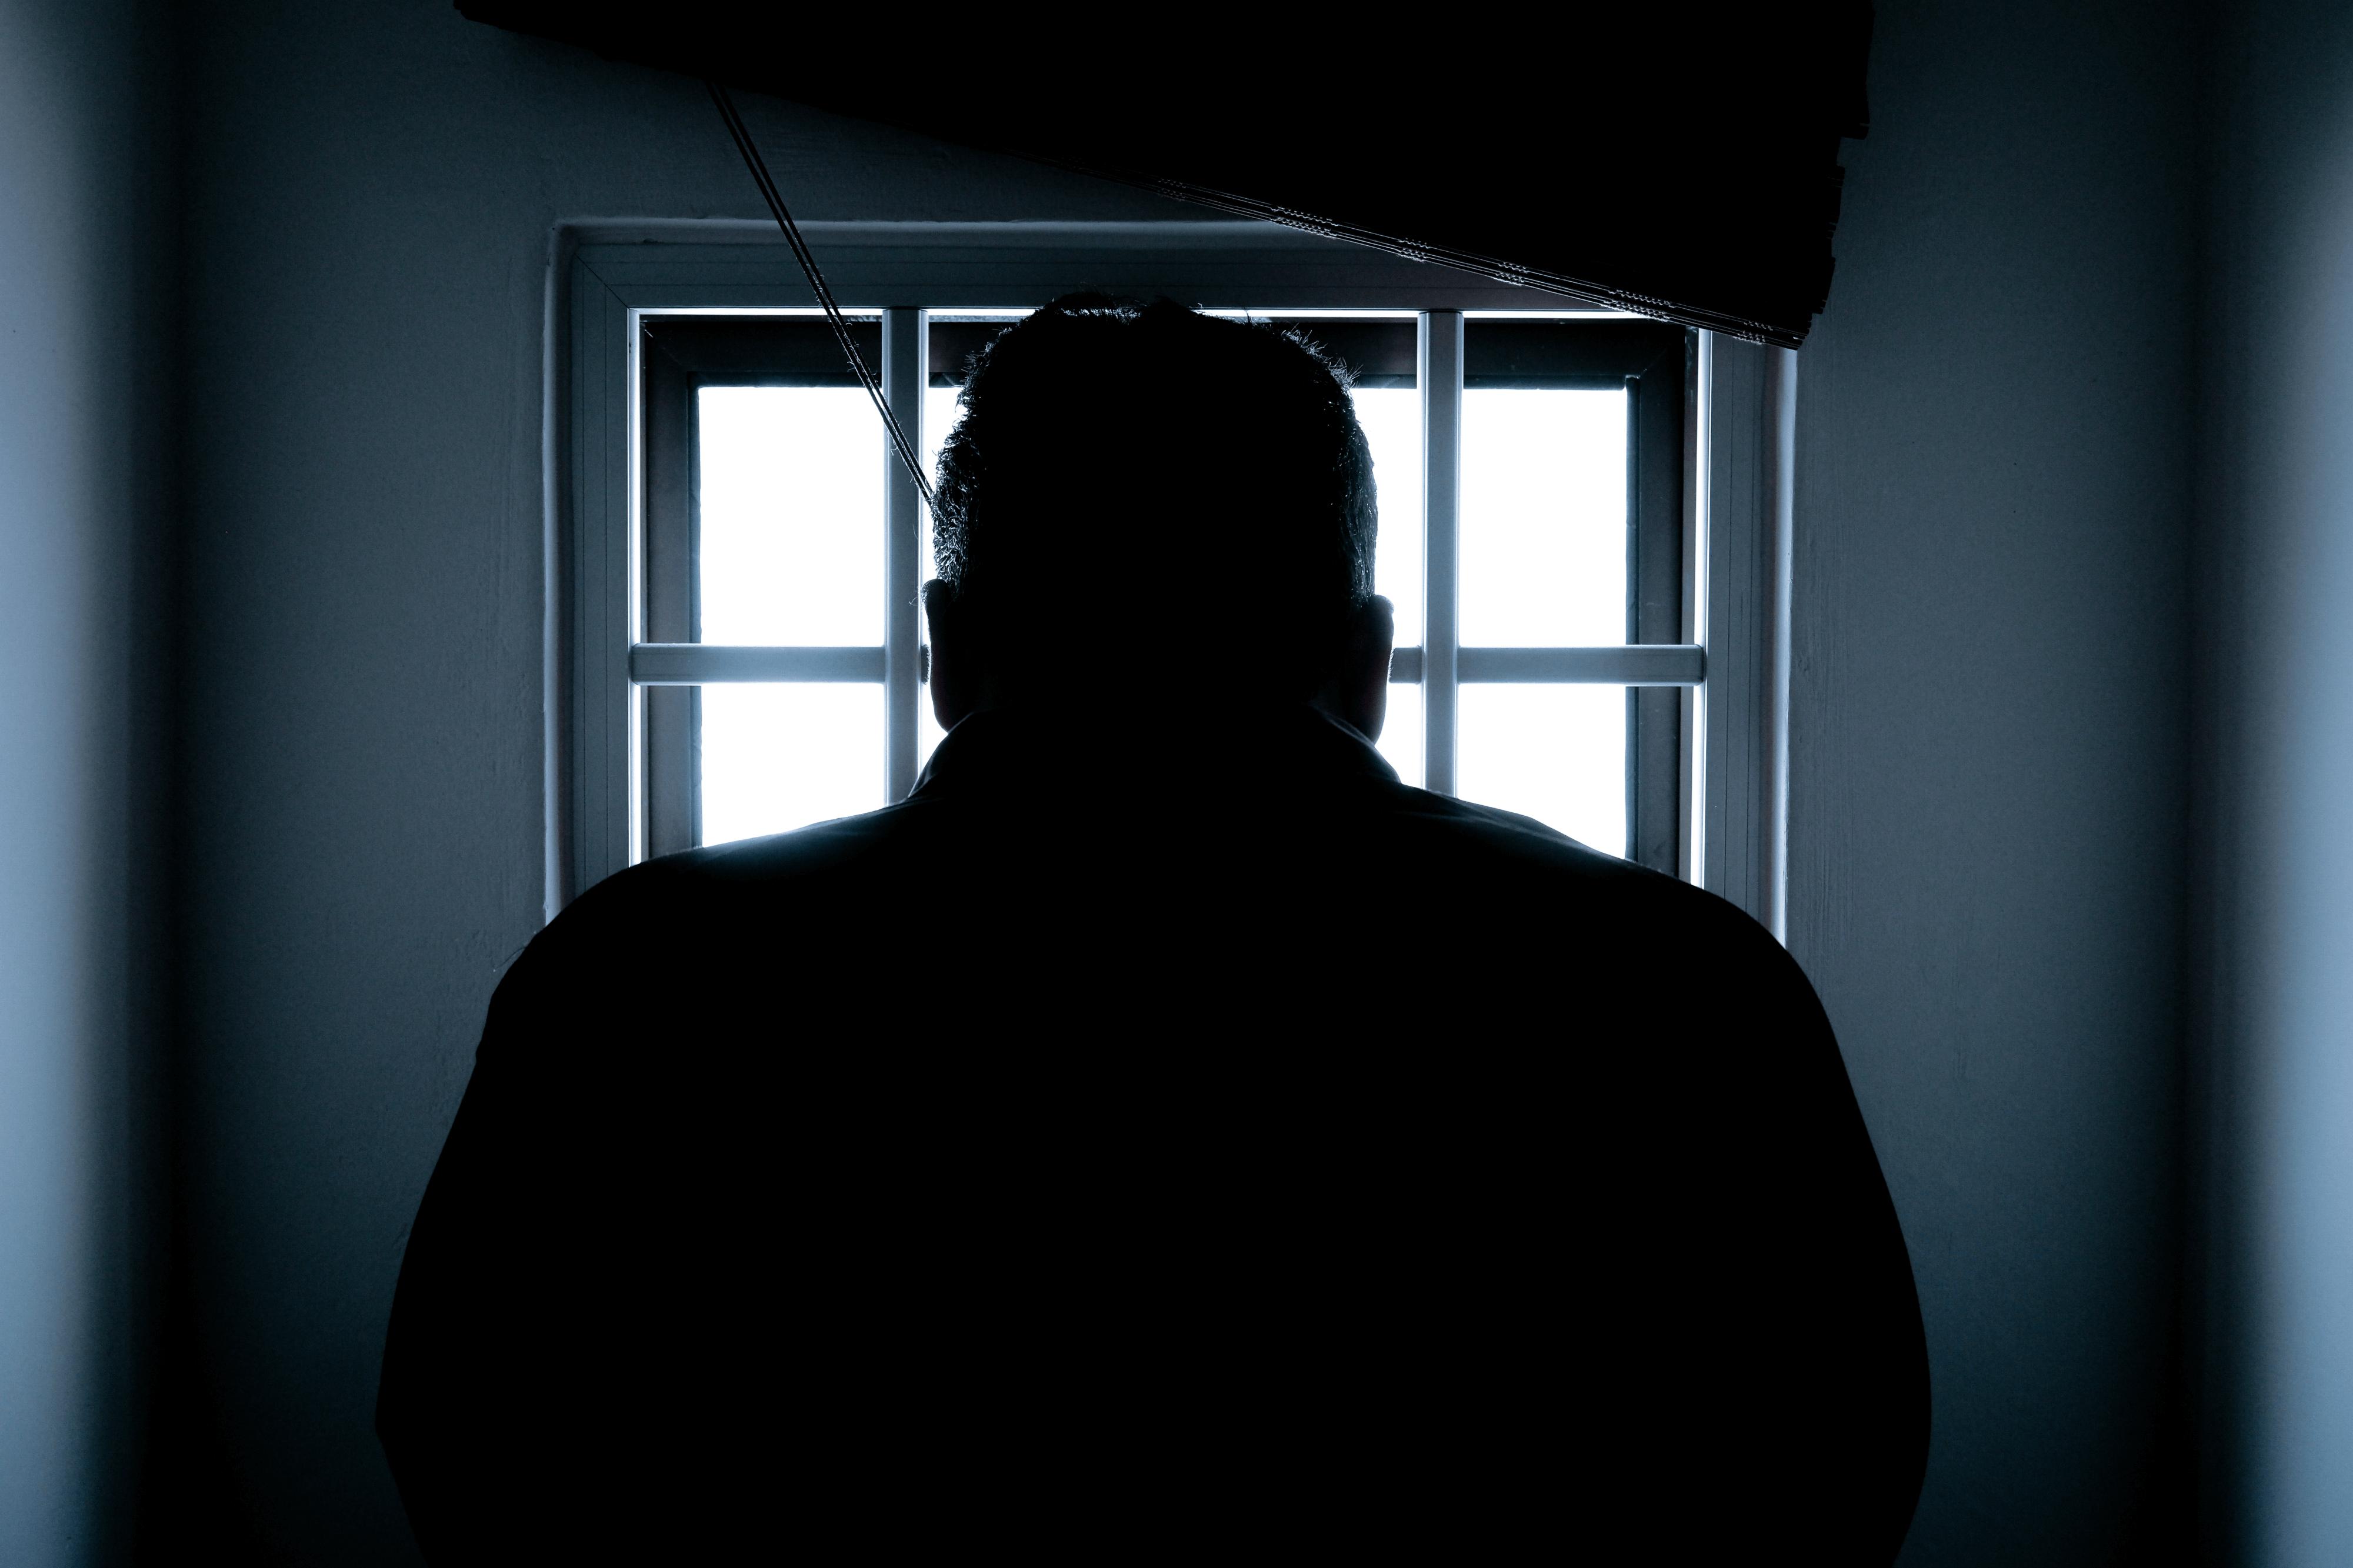 Silhouette Man in the Window